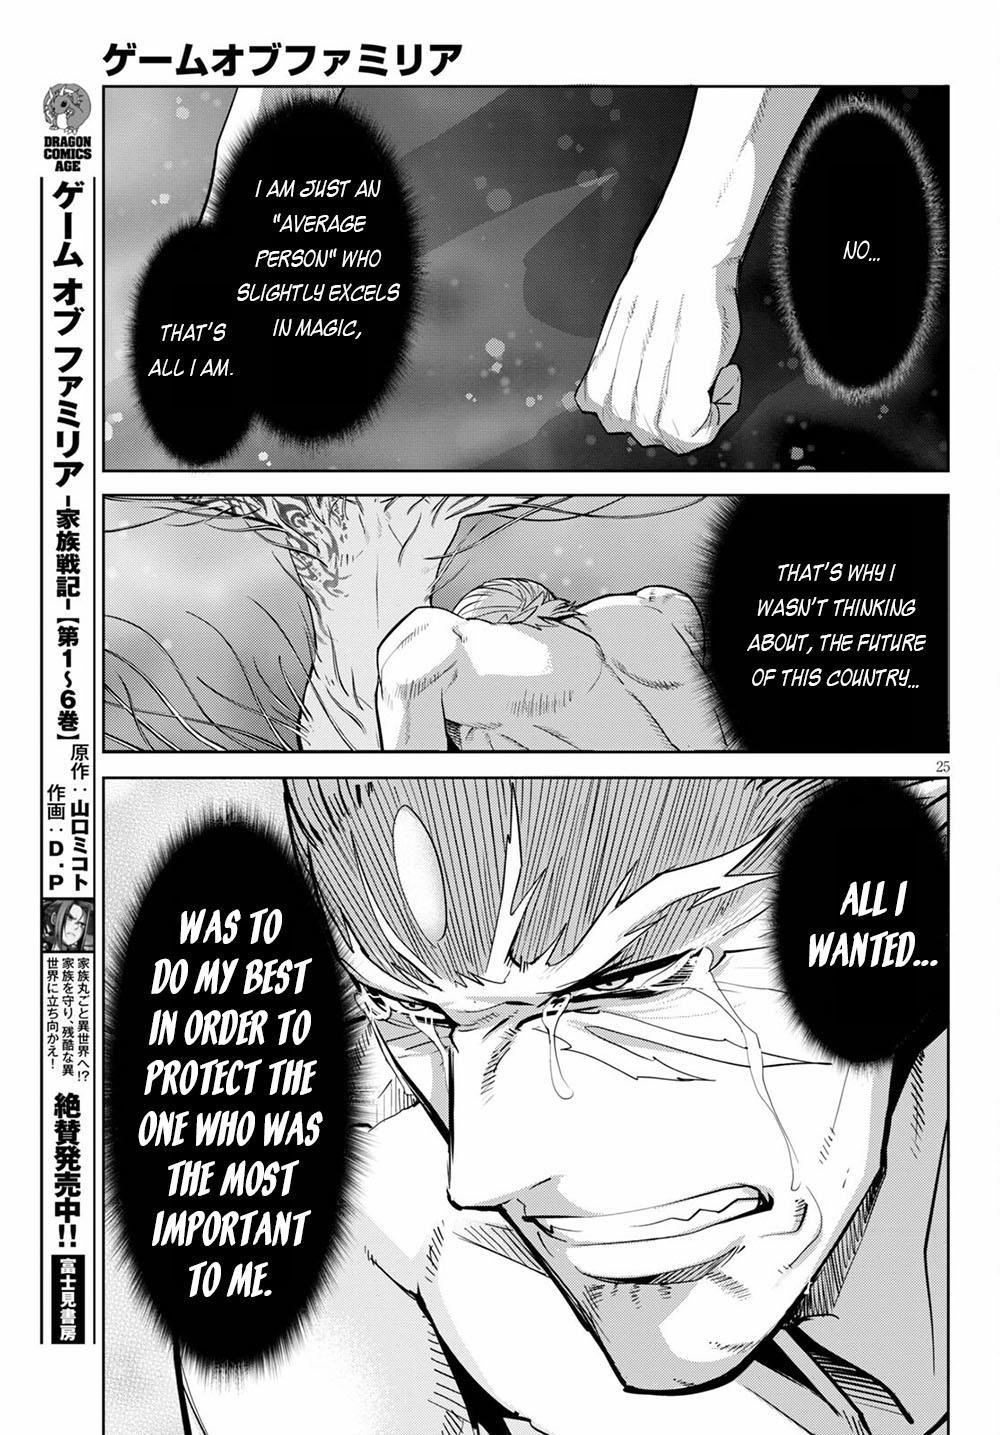 Game Obu Familia - Family Senki Chapter 33 page 26 - Mangakakalots.com